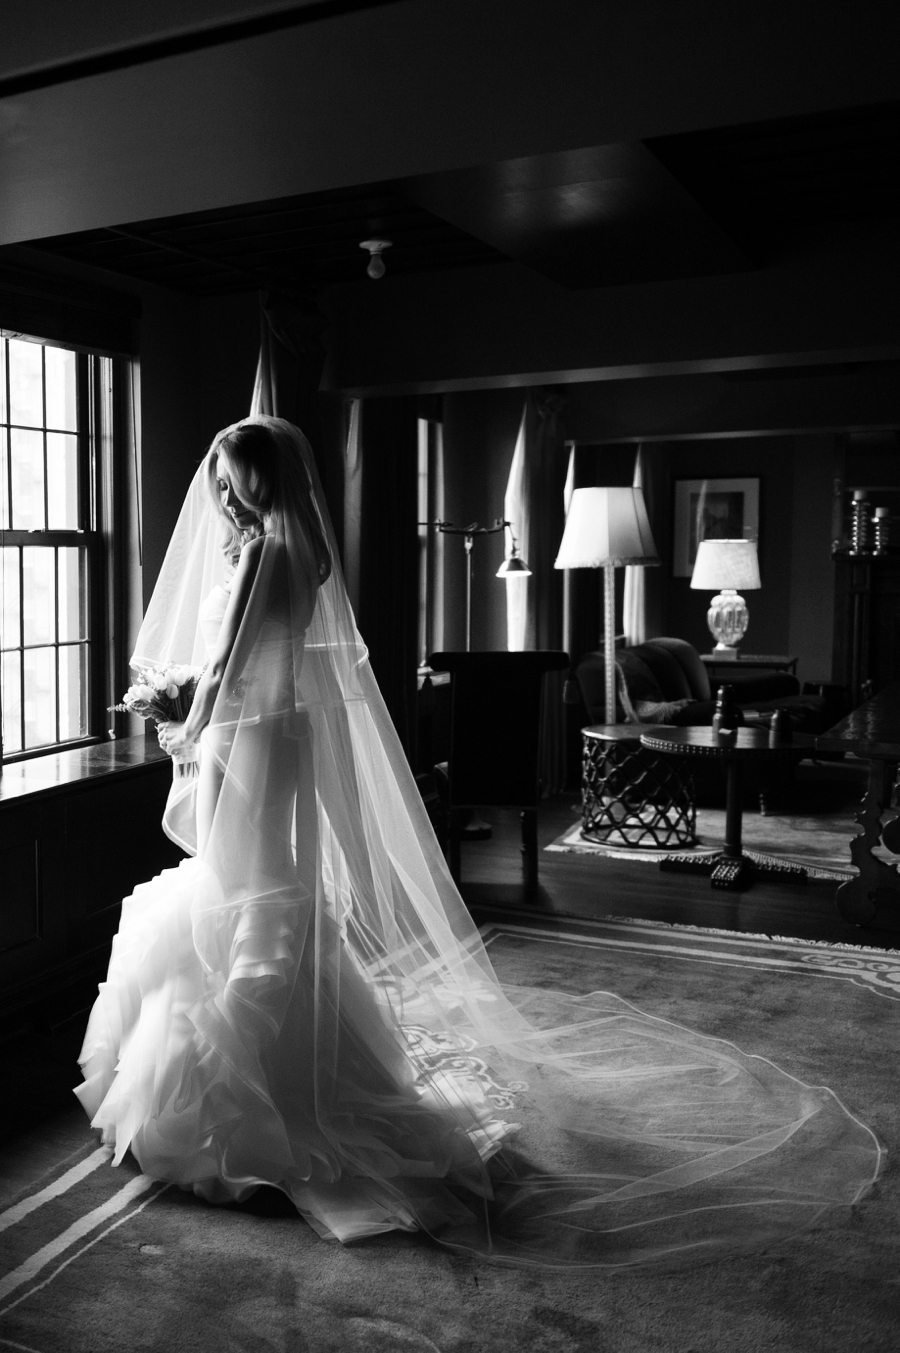 Gramercy_Park_Hotel_NYC_Wedding_MC_0019.jpg